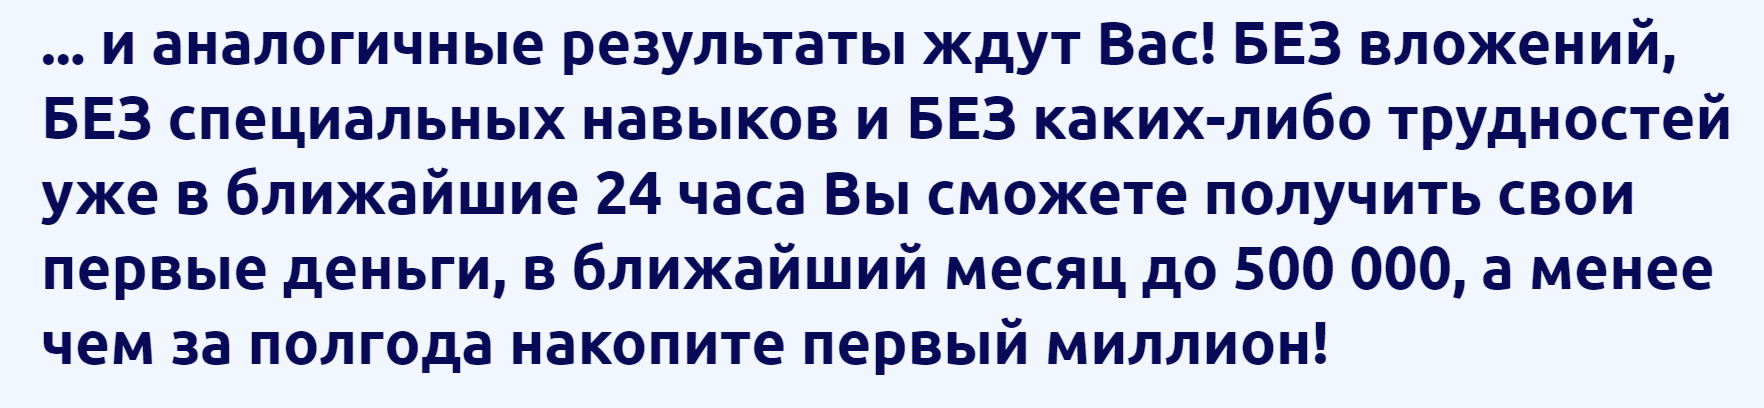 InstaOpt, Владимир Медведев, Elite Infobiz